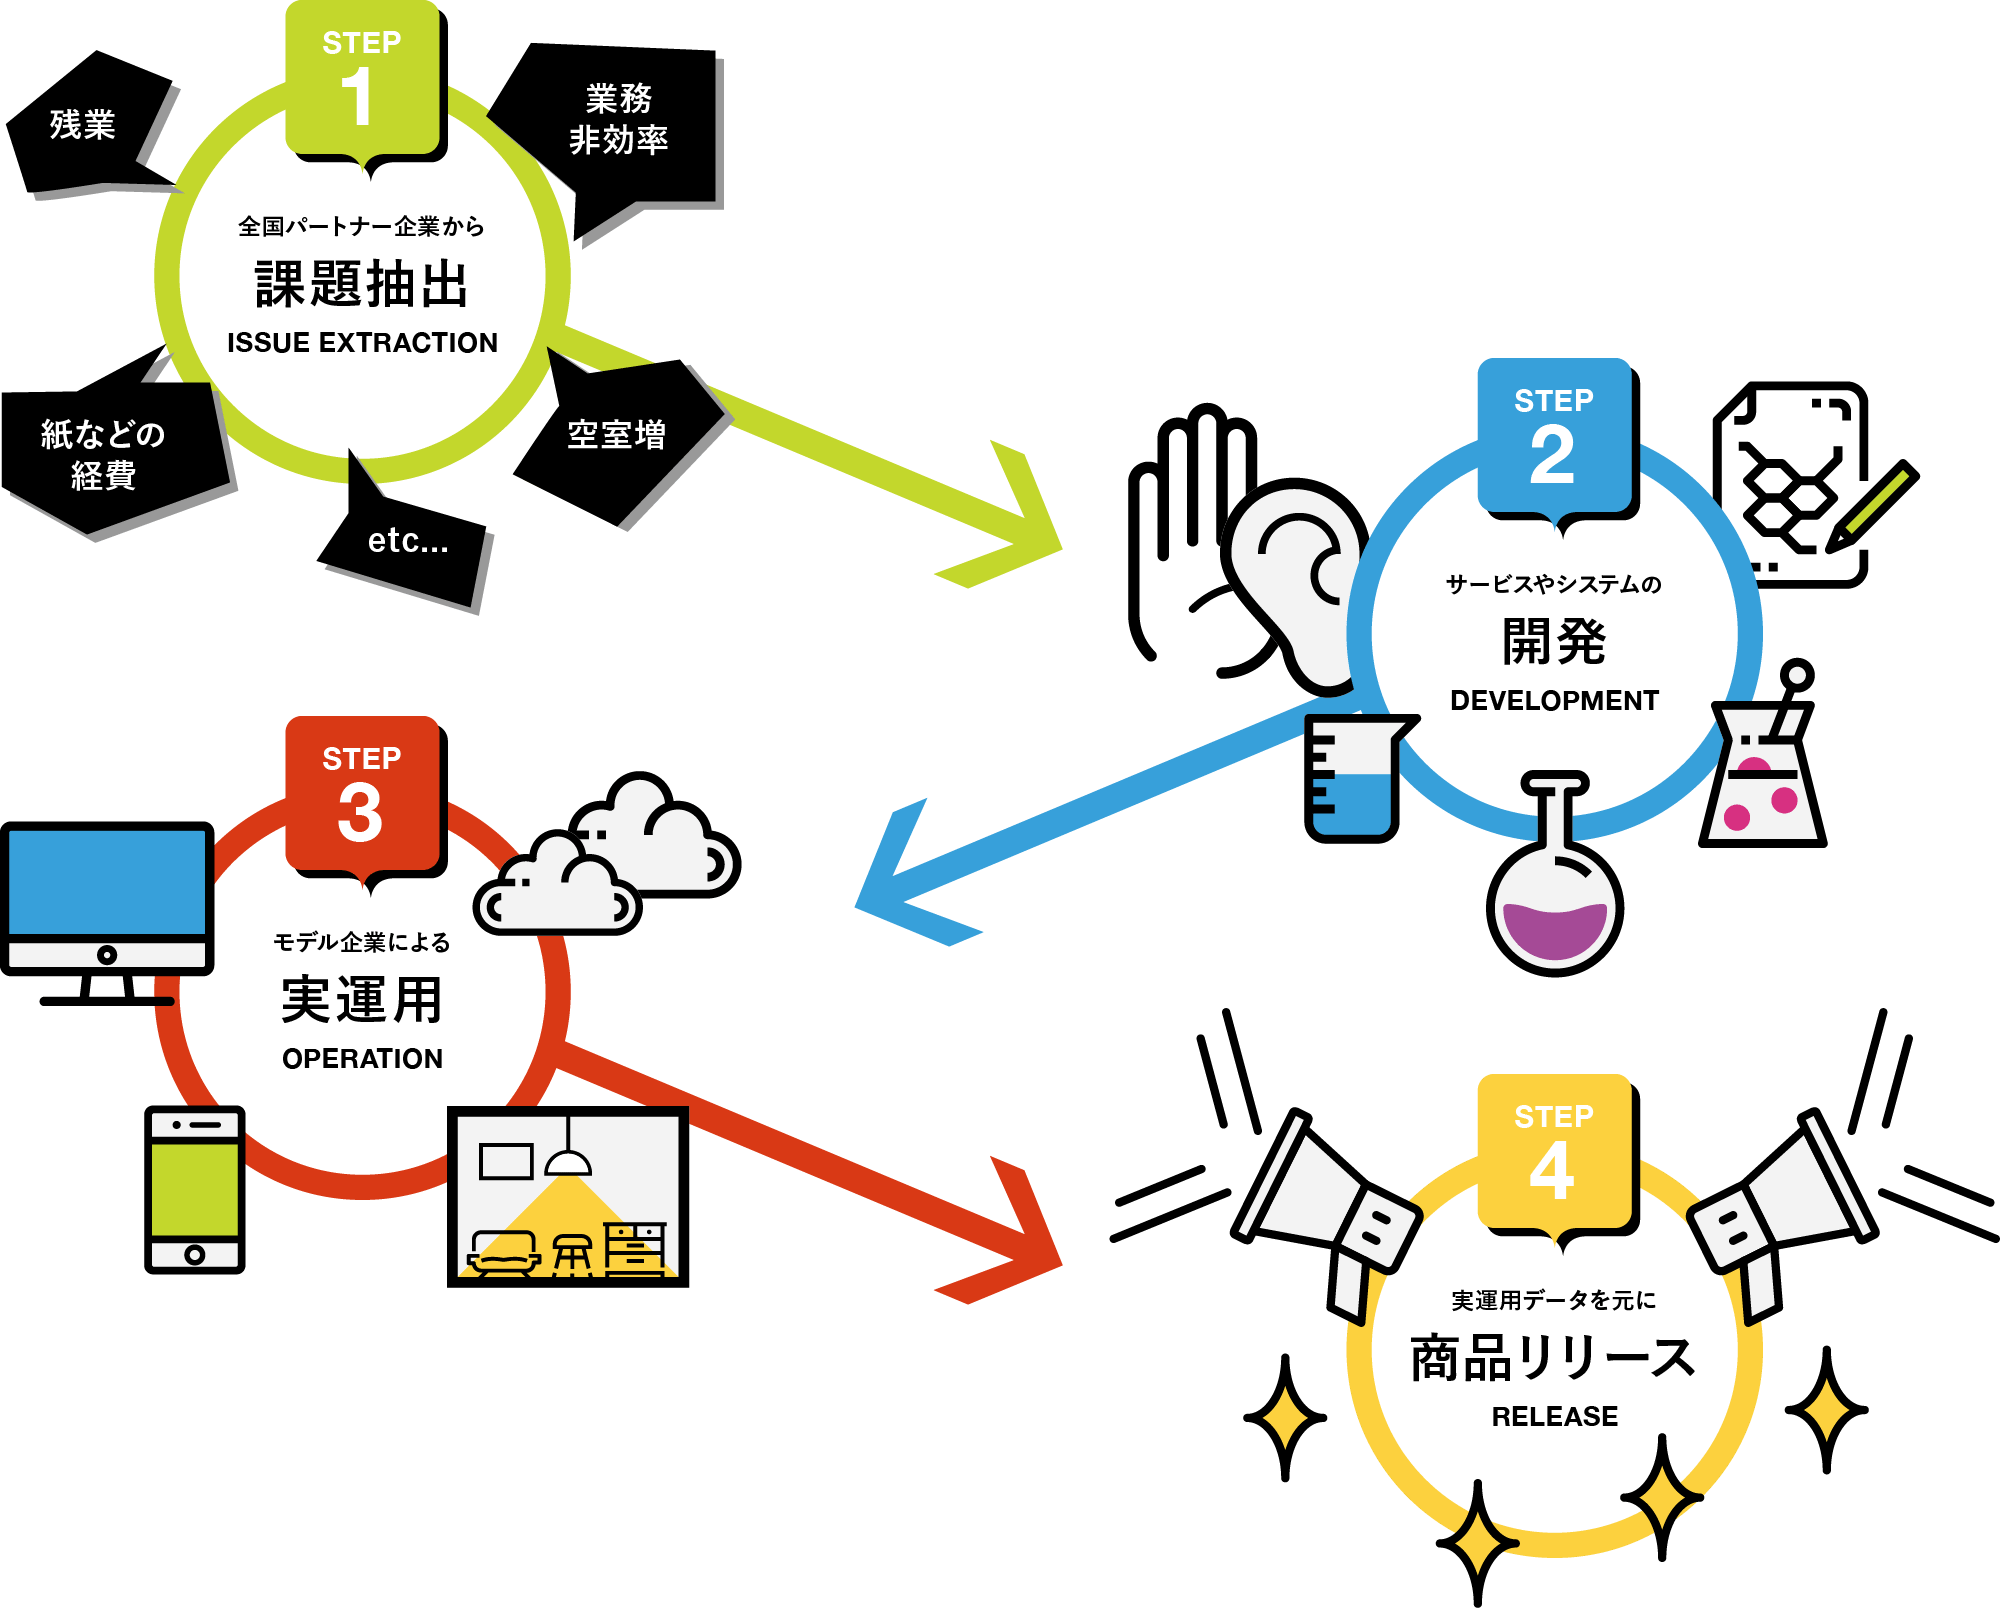 TATSUJINの商品開発フロー